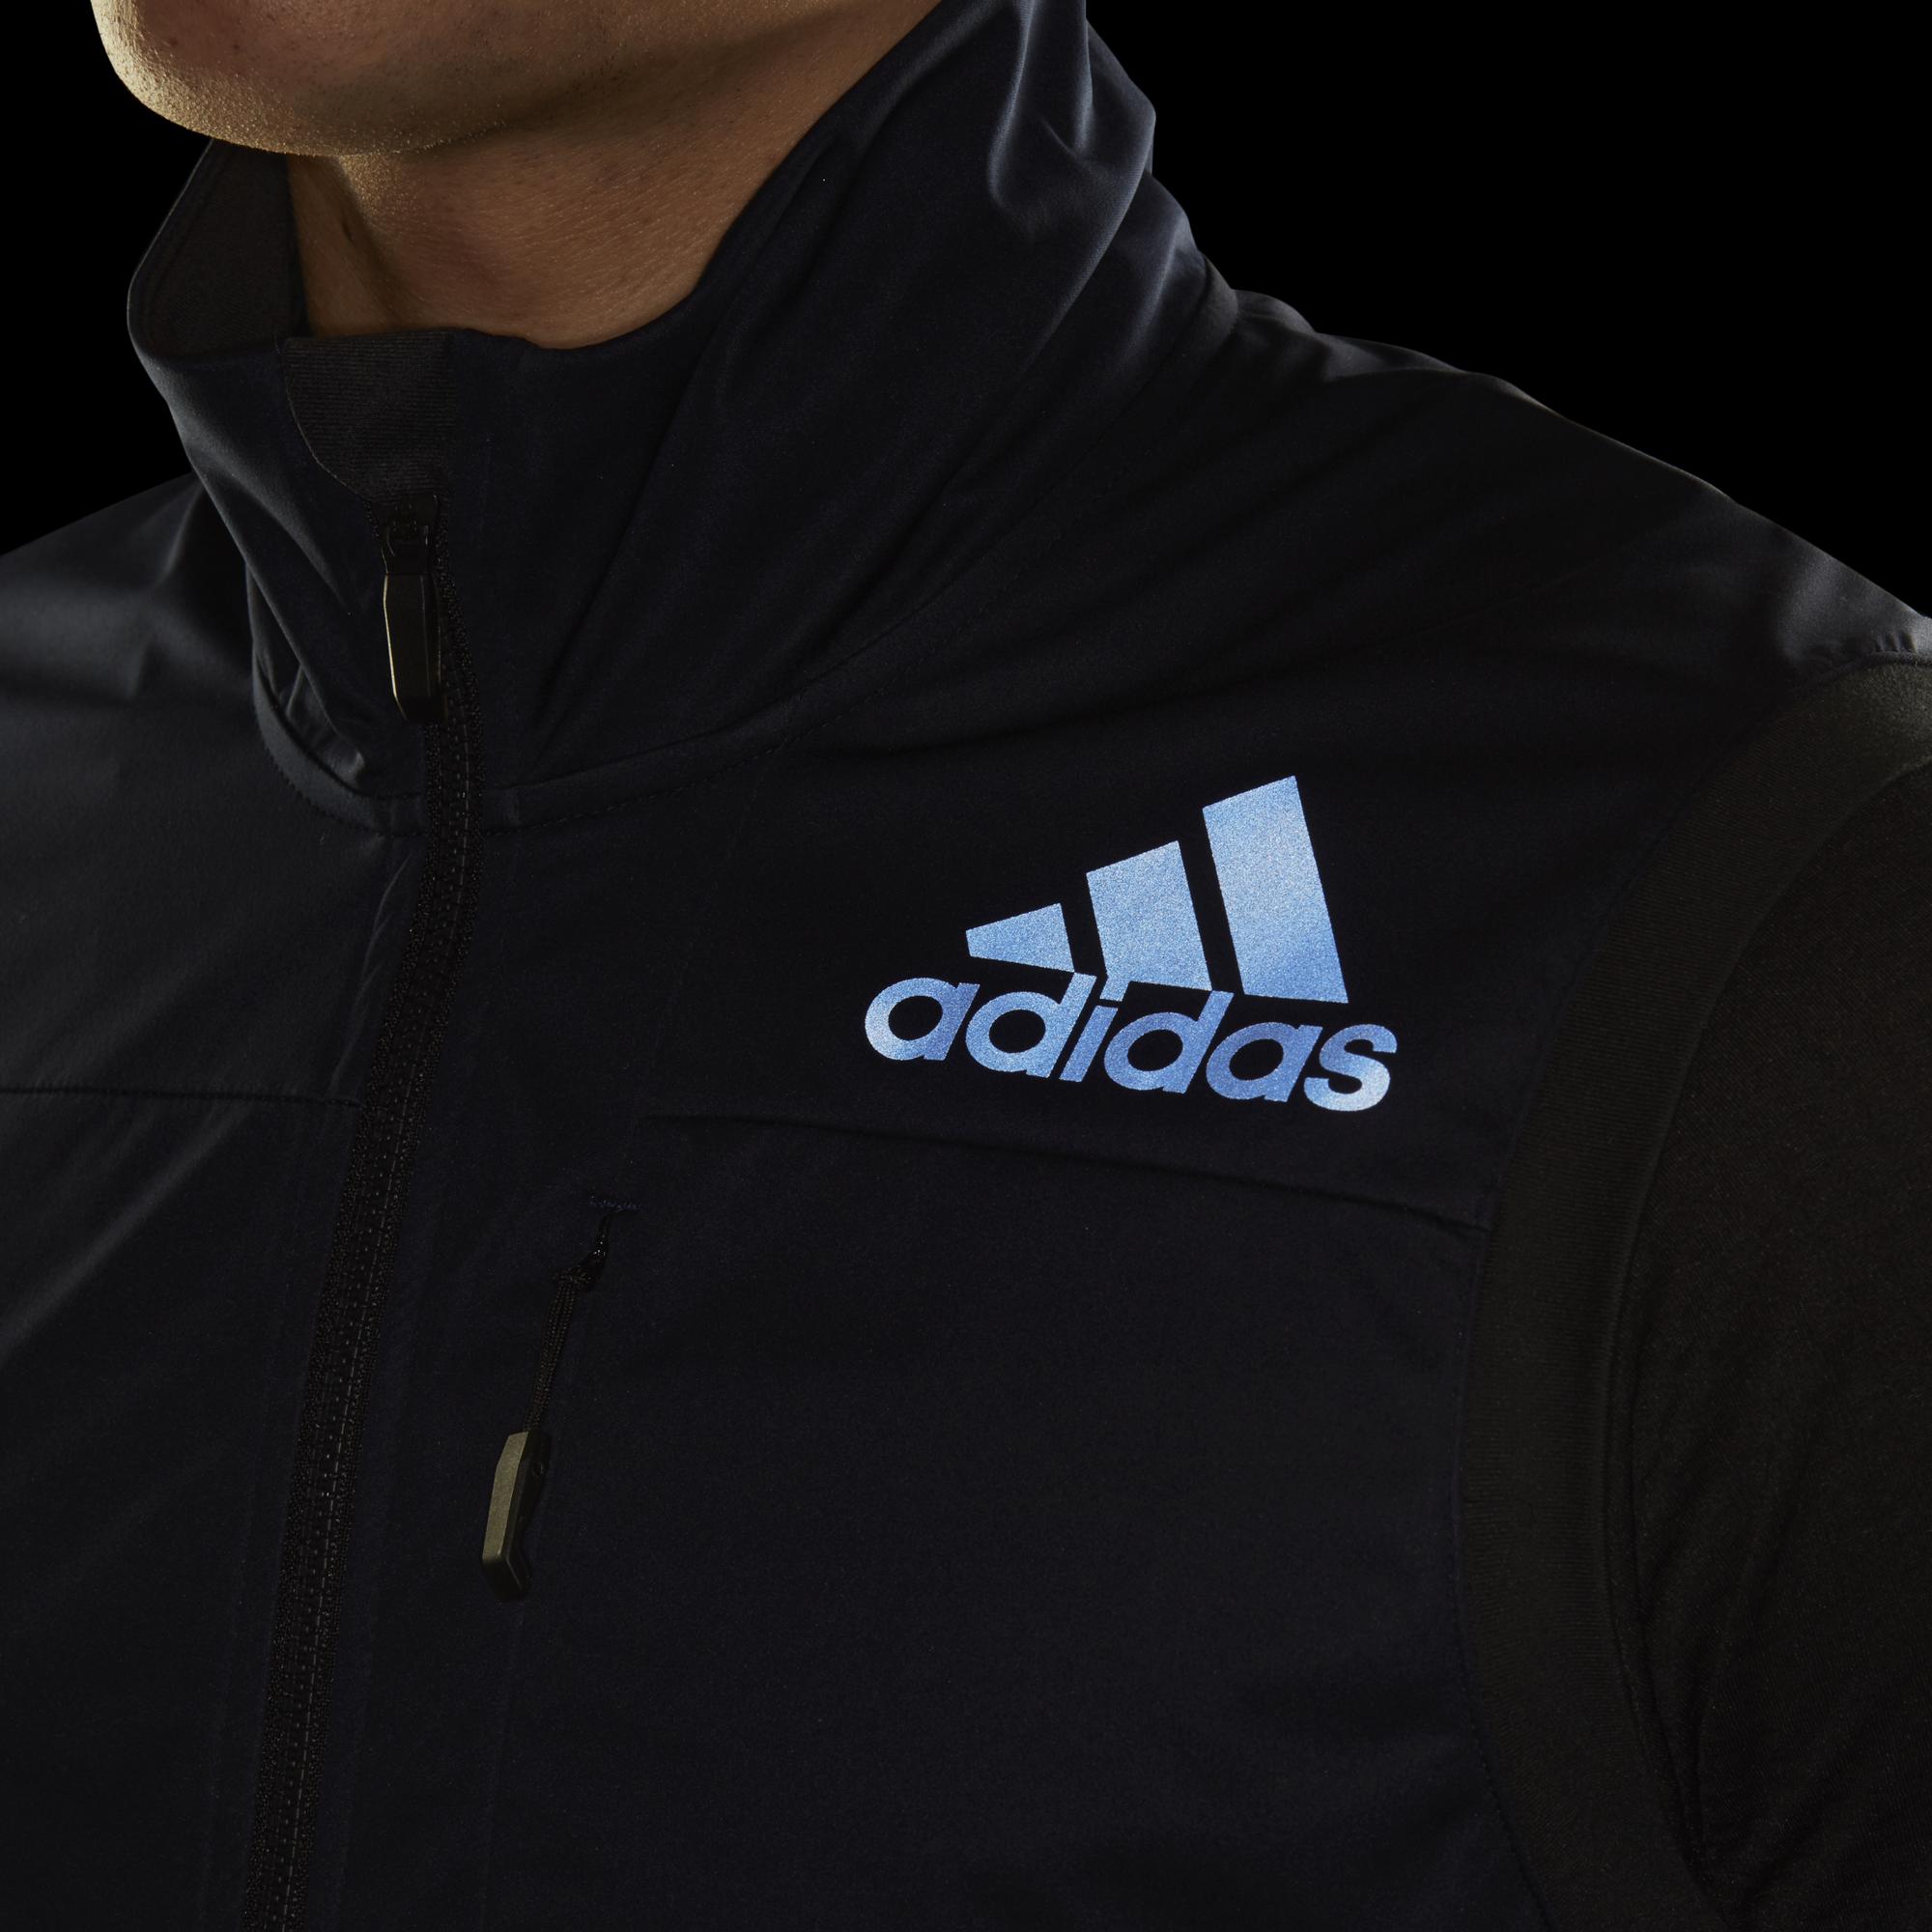 ef93acf6eb369 veste-sans-manches-adidas-xperior-vest-men-ink-black.jpg